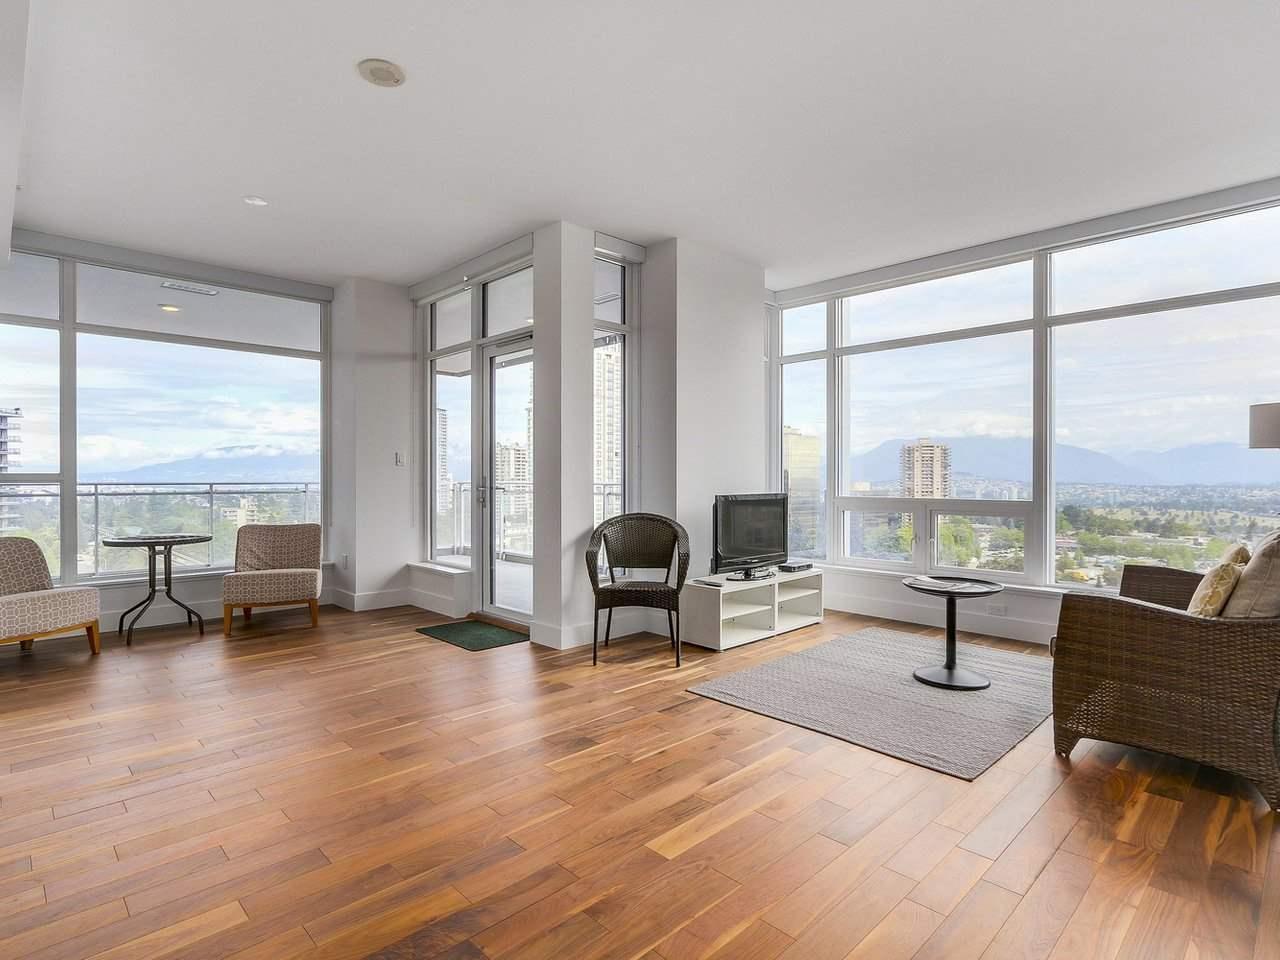 Condo Apartment at 1202 4360 BERESFORD STREET, Unit 1202, Burnaby South, British Columbia. Image 6